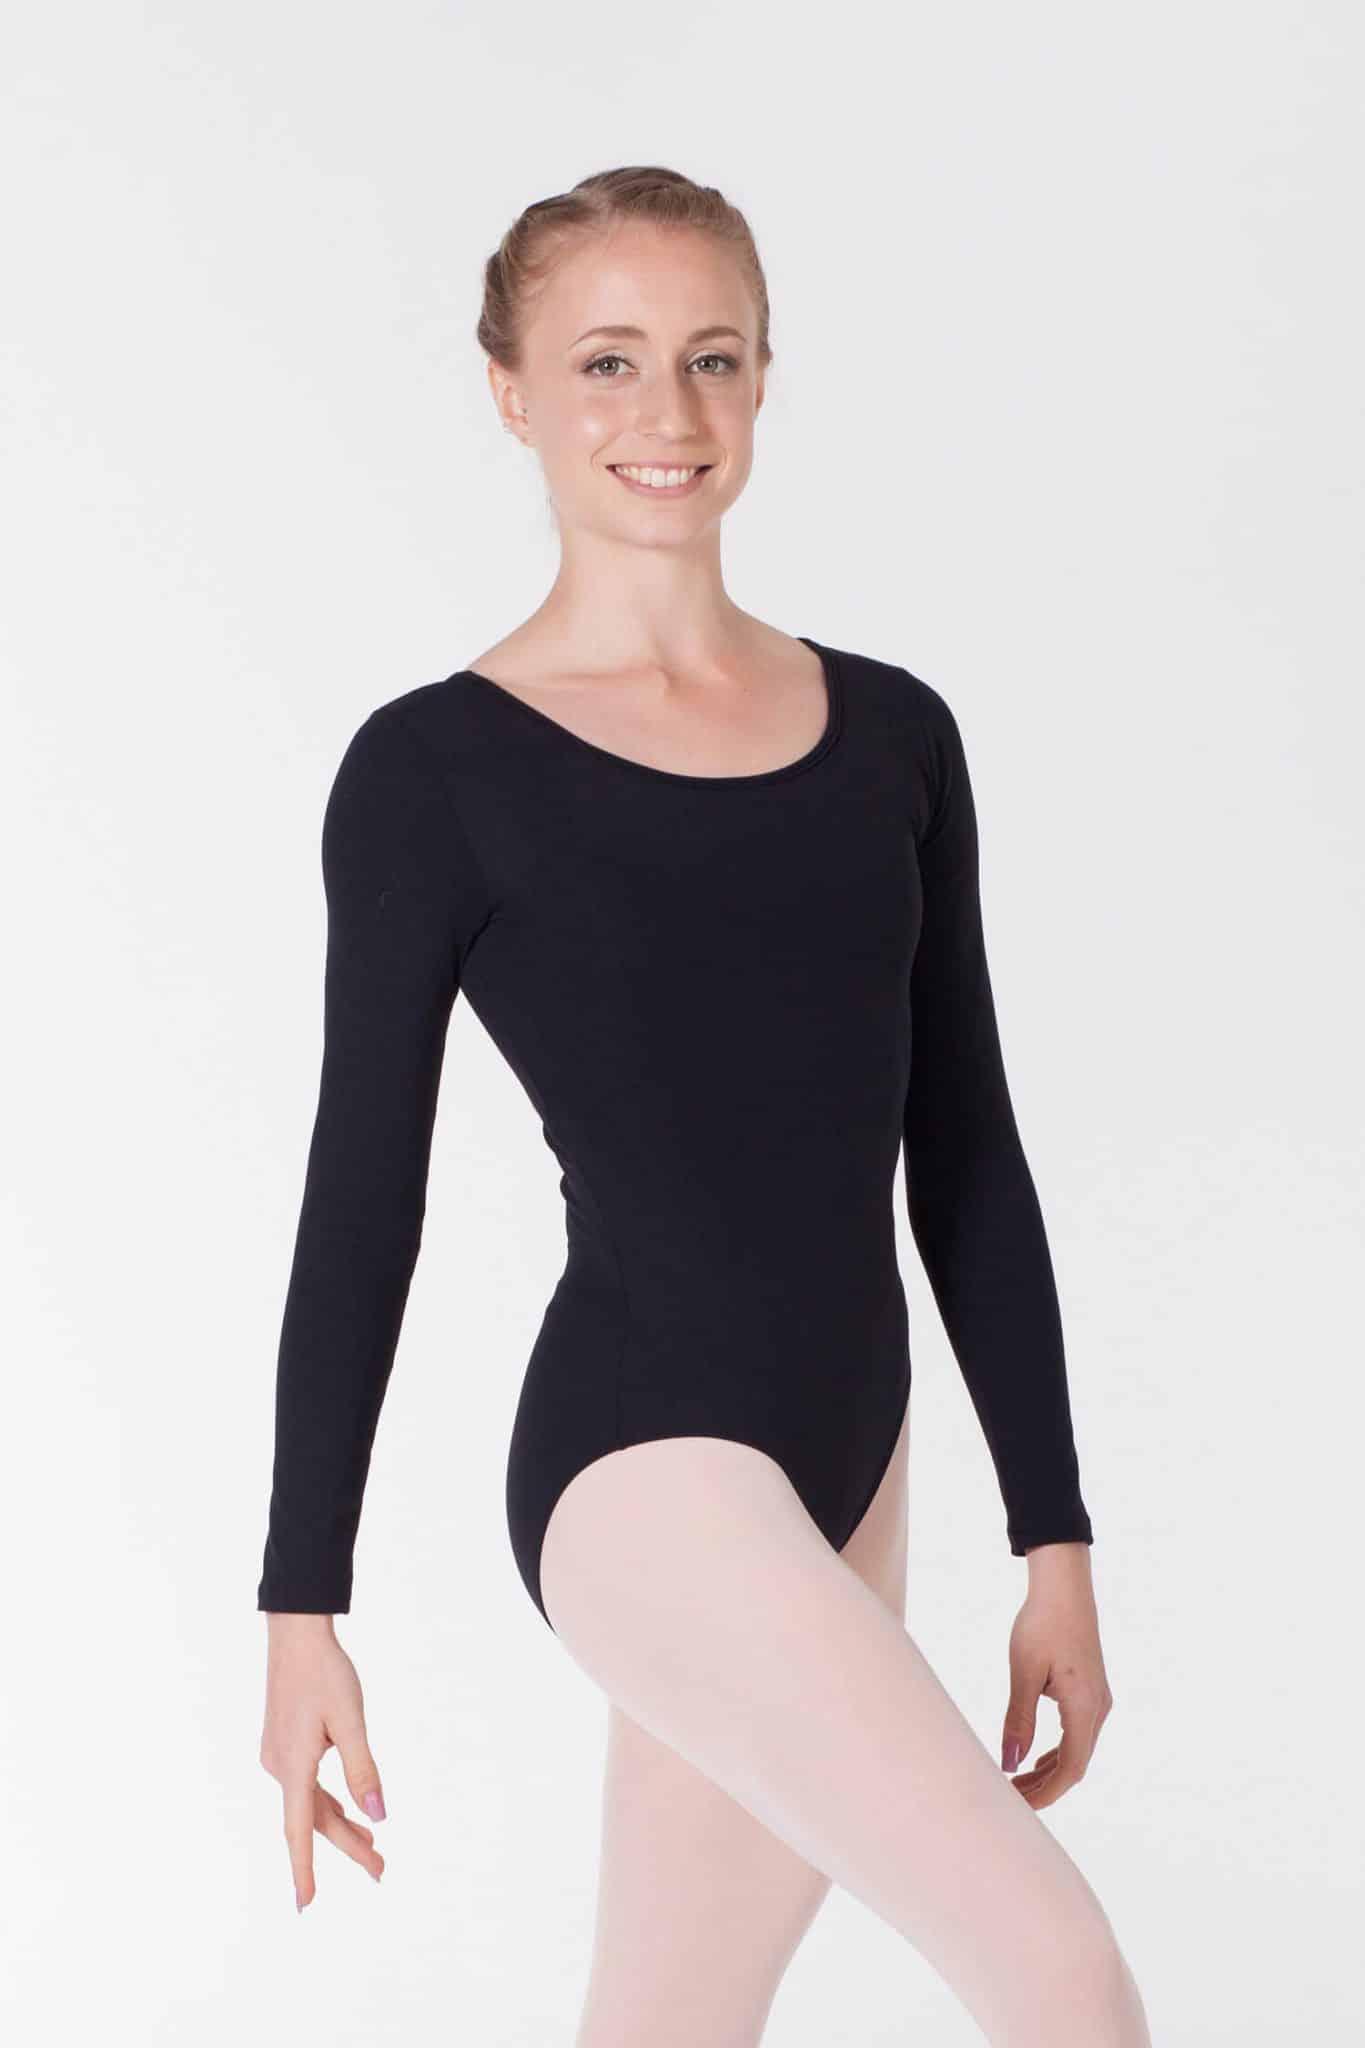 Maillot de ballet negro manga larga 3010 Ne